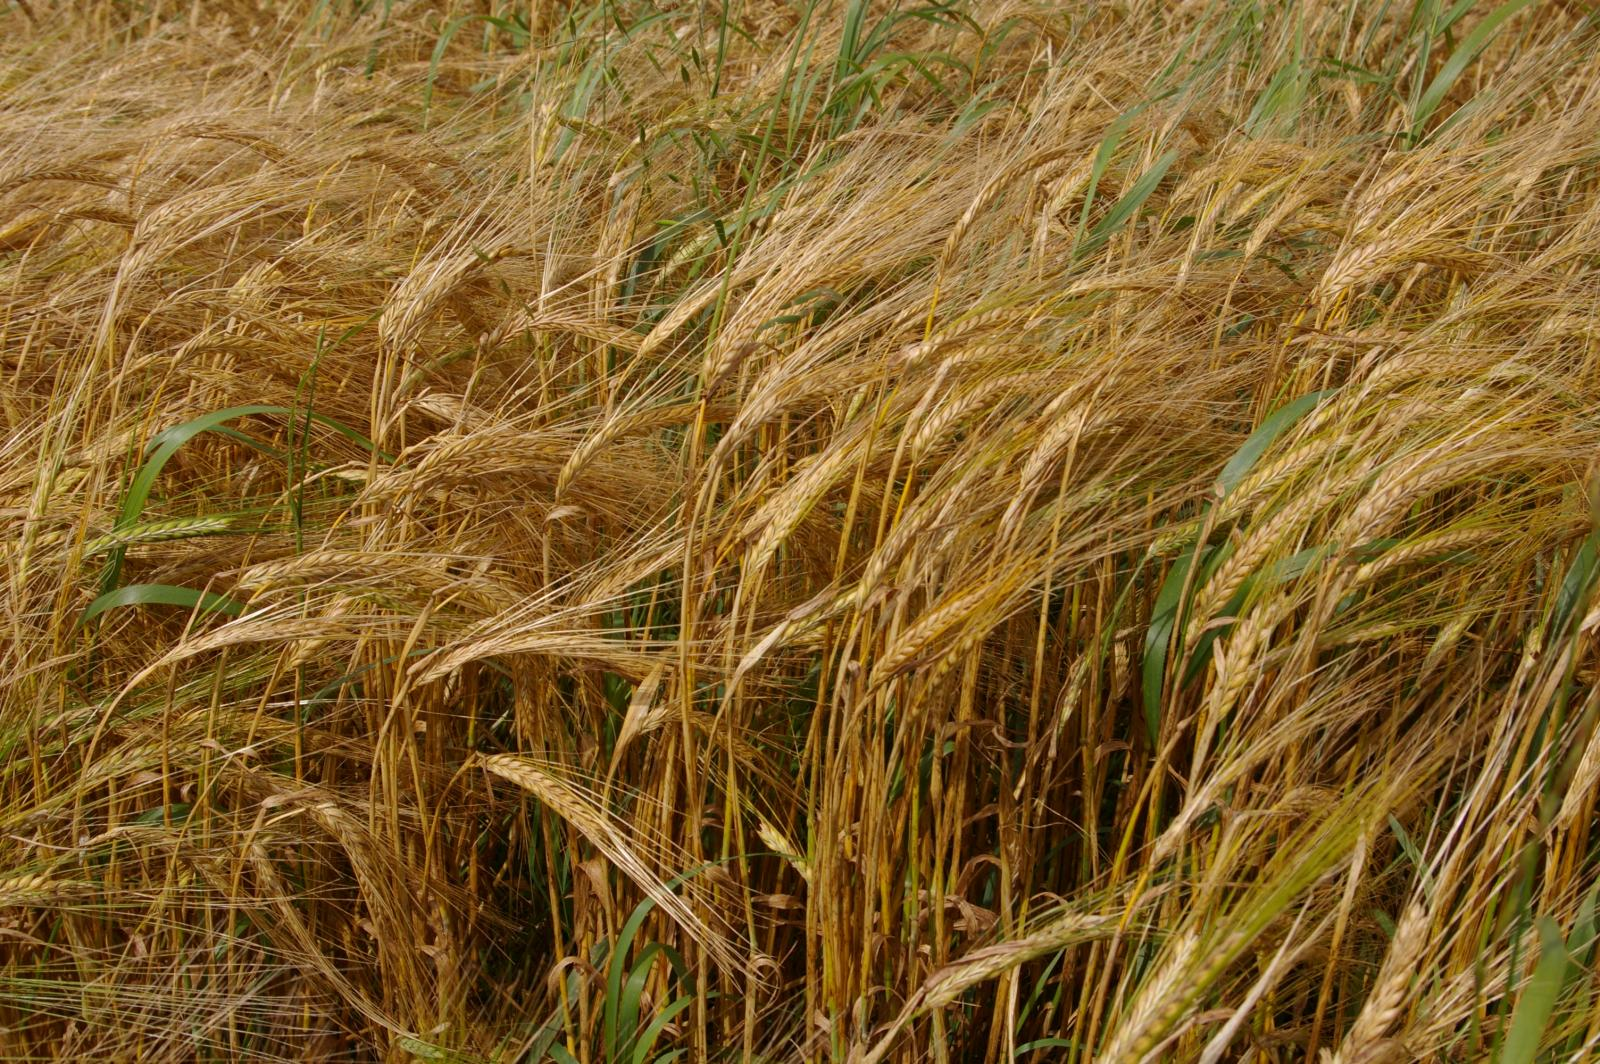 barley fields by nitrok-#37